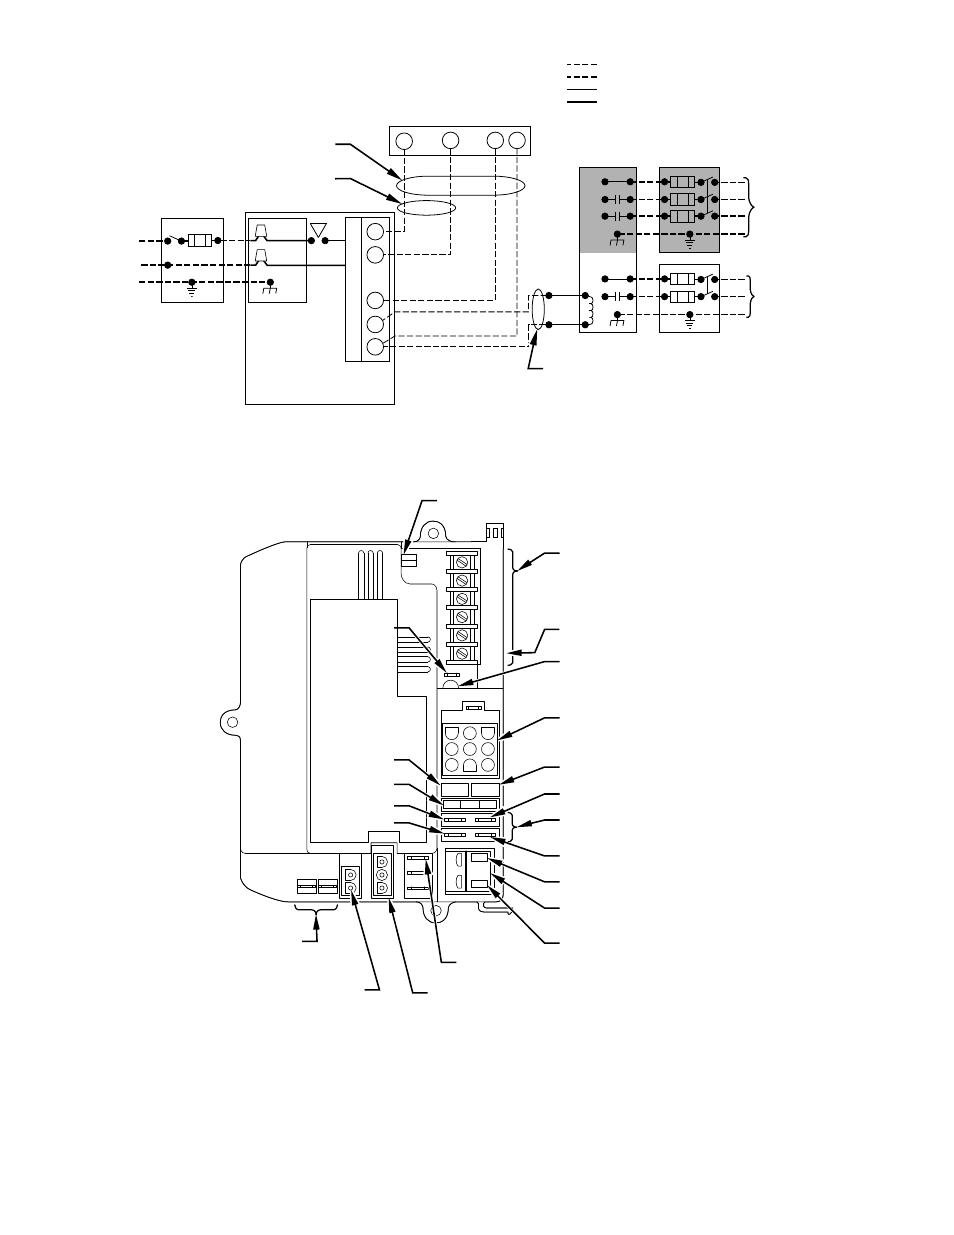 Fig 11 Control Board Carrier Series 131 58pav User Manual